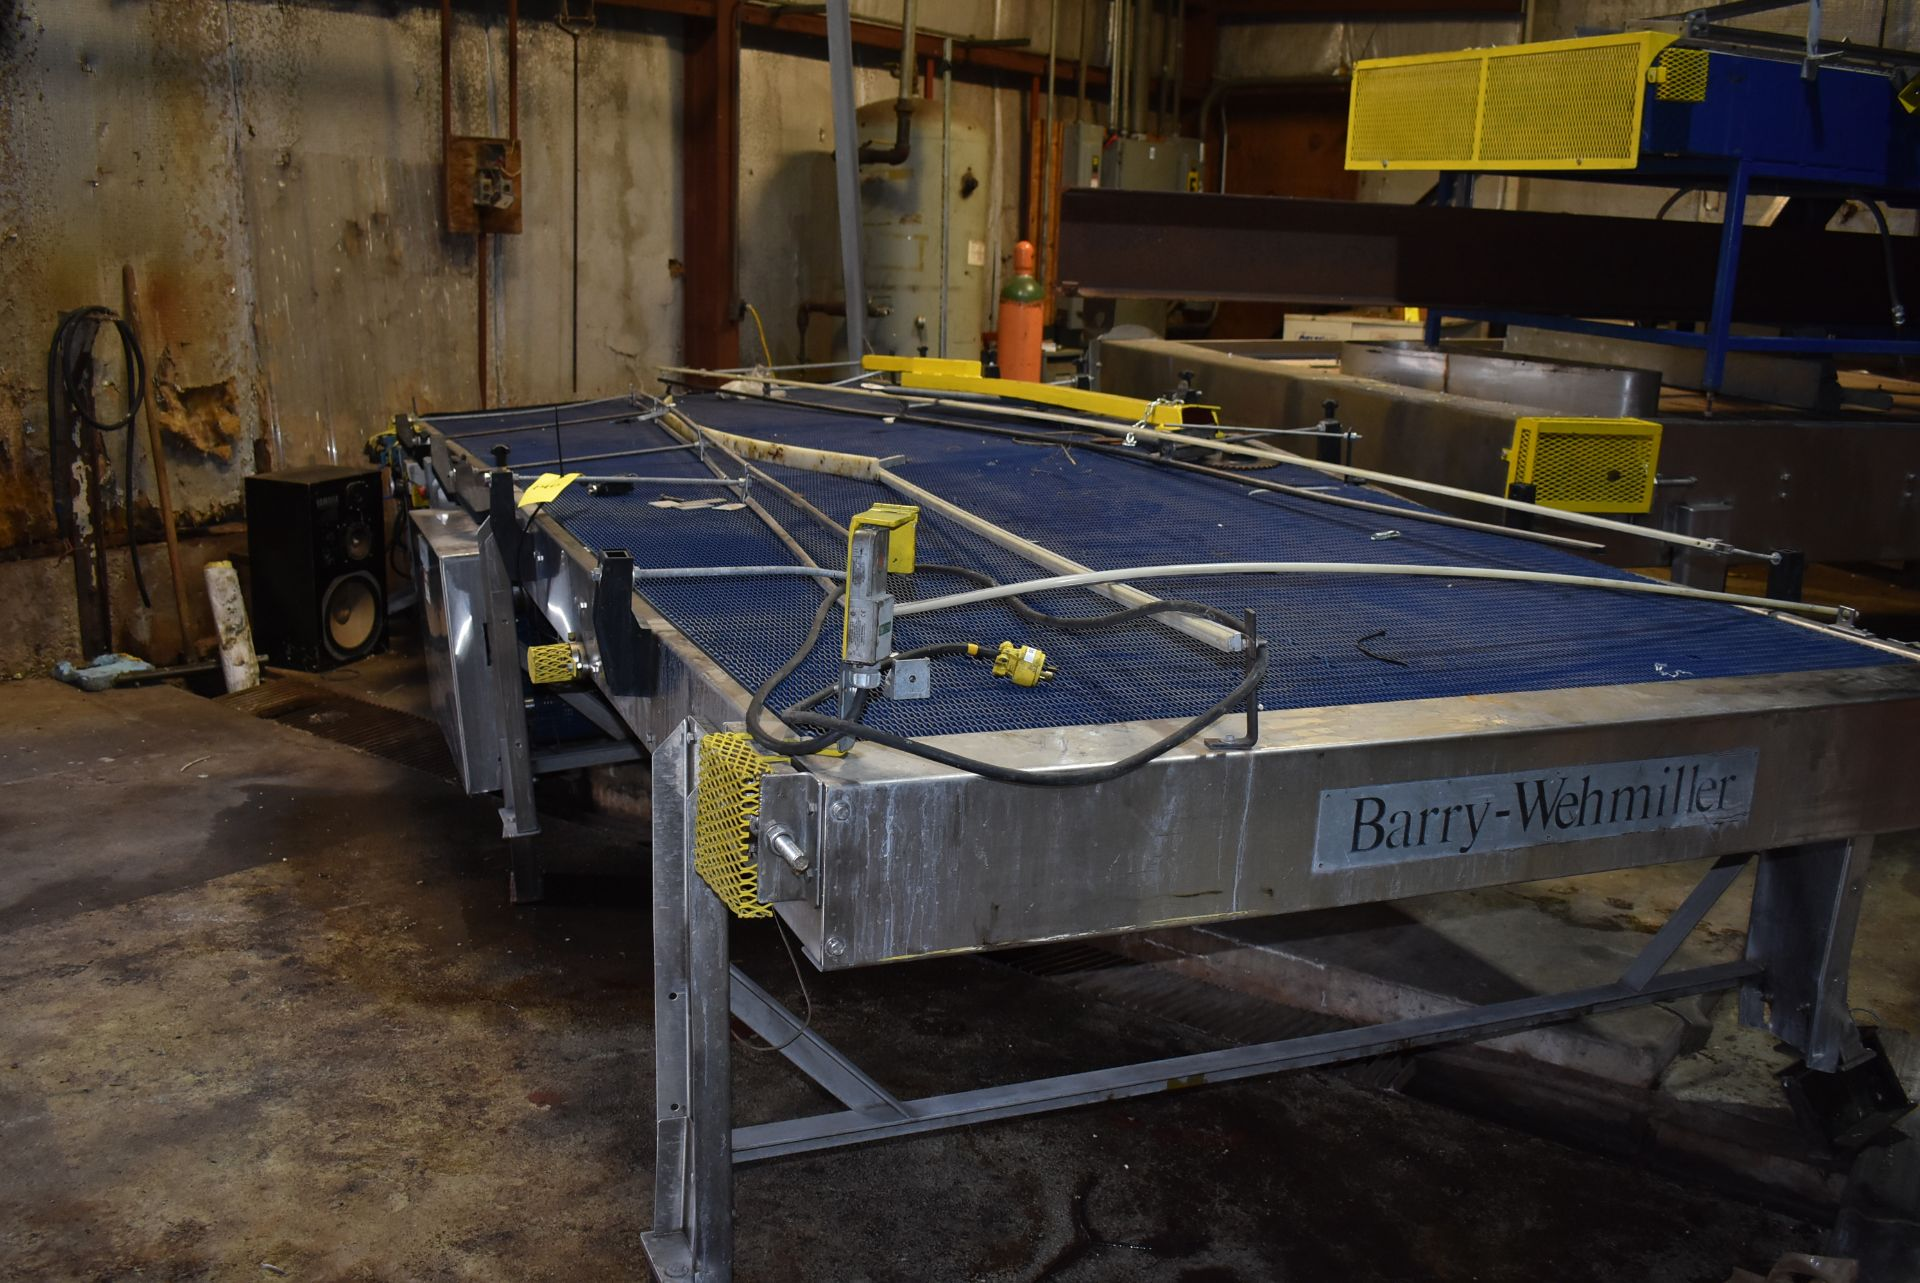 Motorized Belt Conveyor/Accumulation Table, 20' x 6'